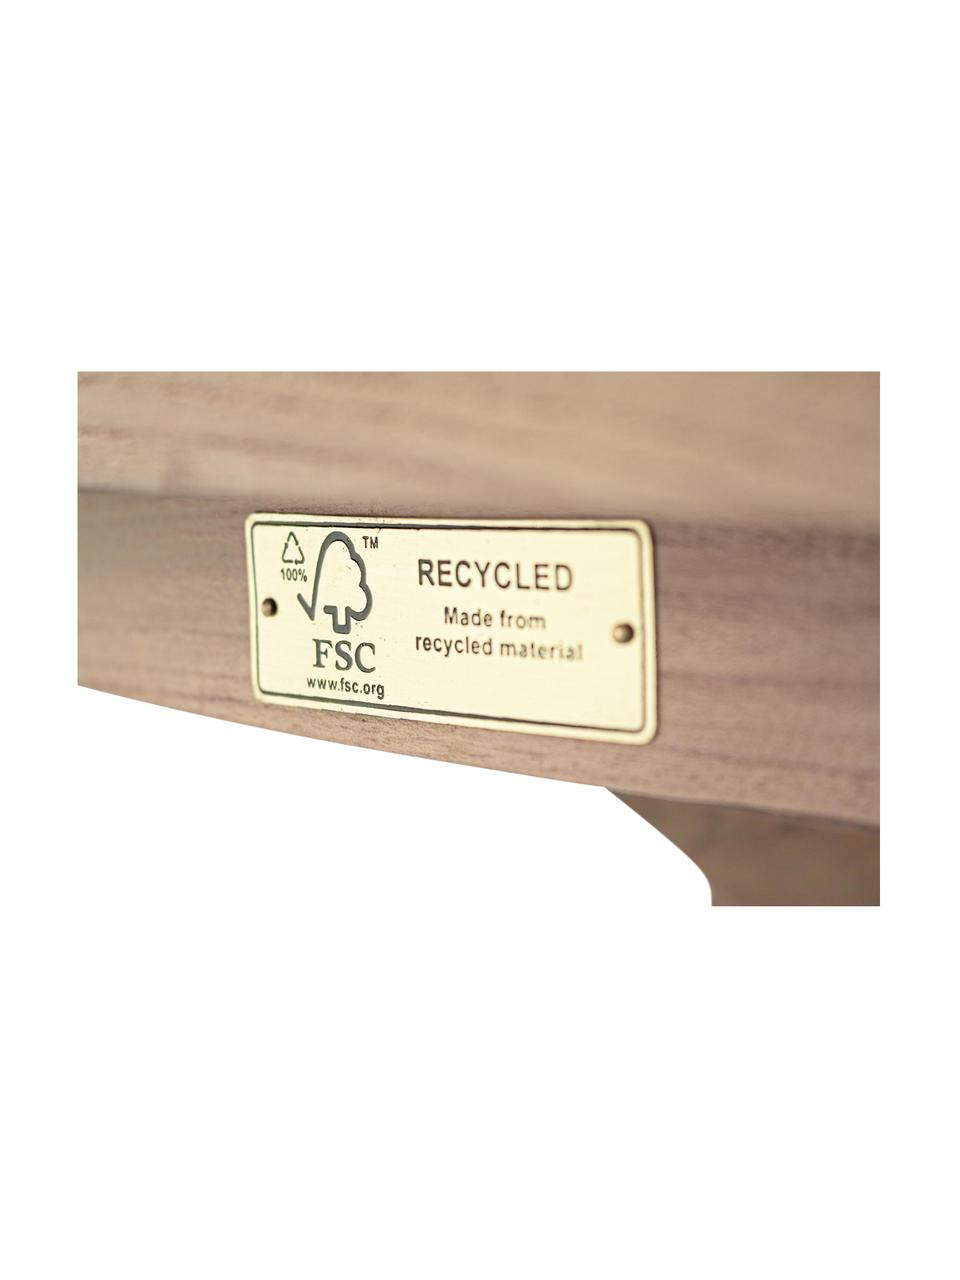 Runder Esstisch Rift mit recycelter Teakholzplatte, Ø 135 cm, Teakholz, recycled und FSC-zertifiziert, Recyceltes Teakholz, Ø 135 x H 76 cm